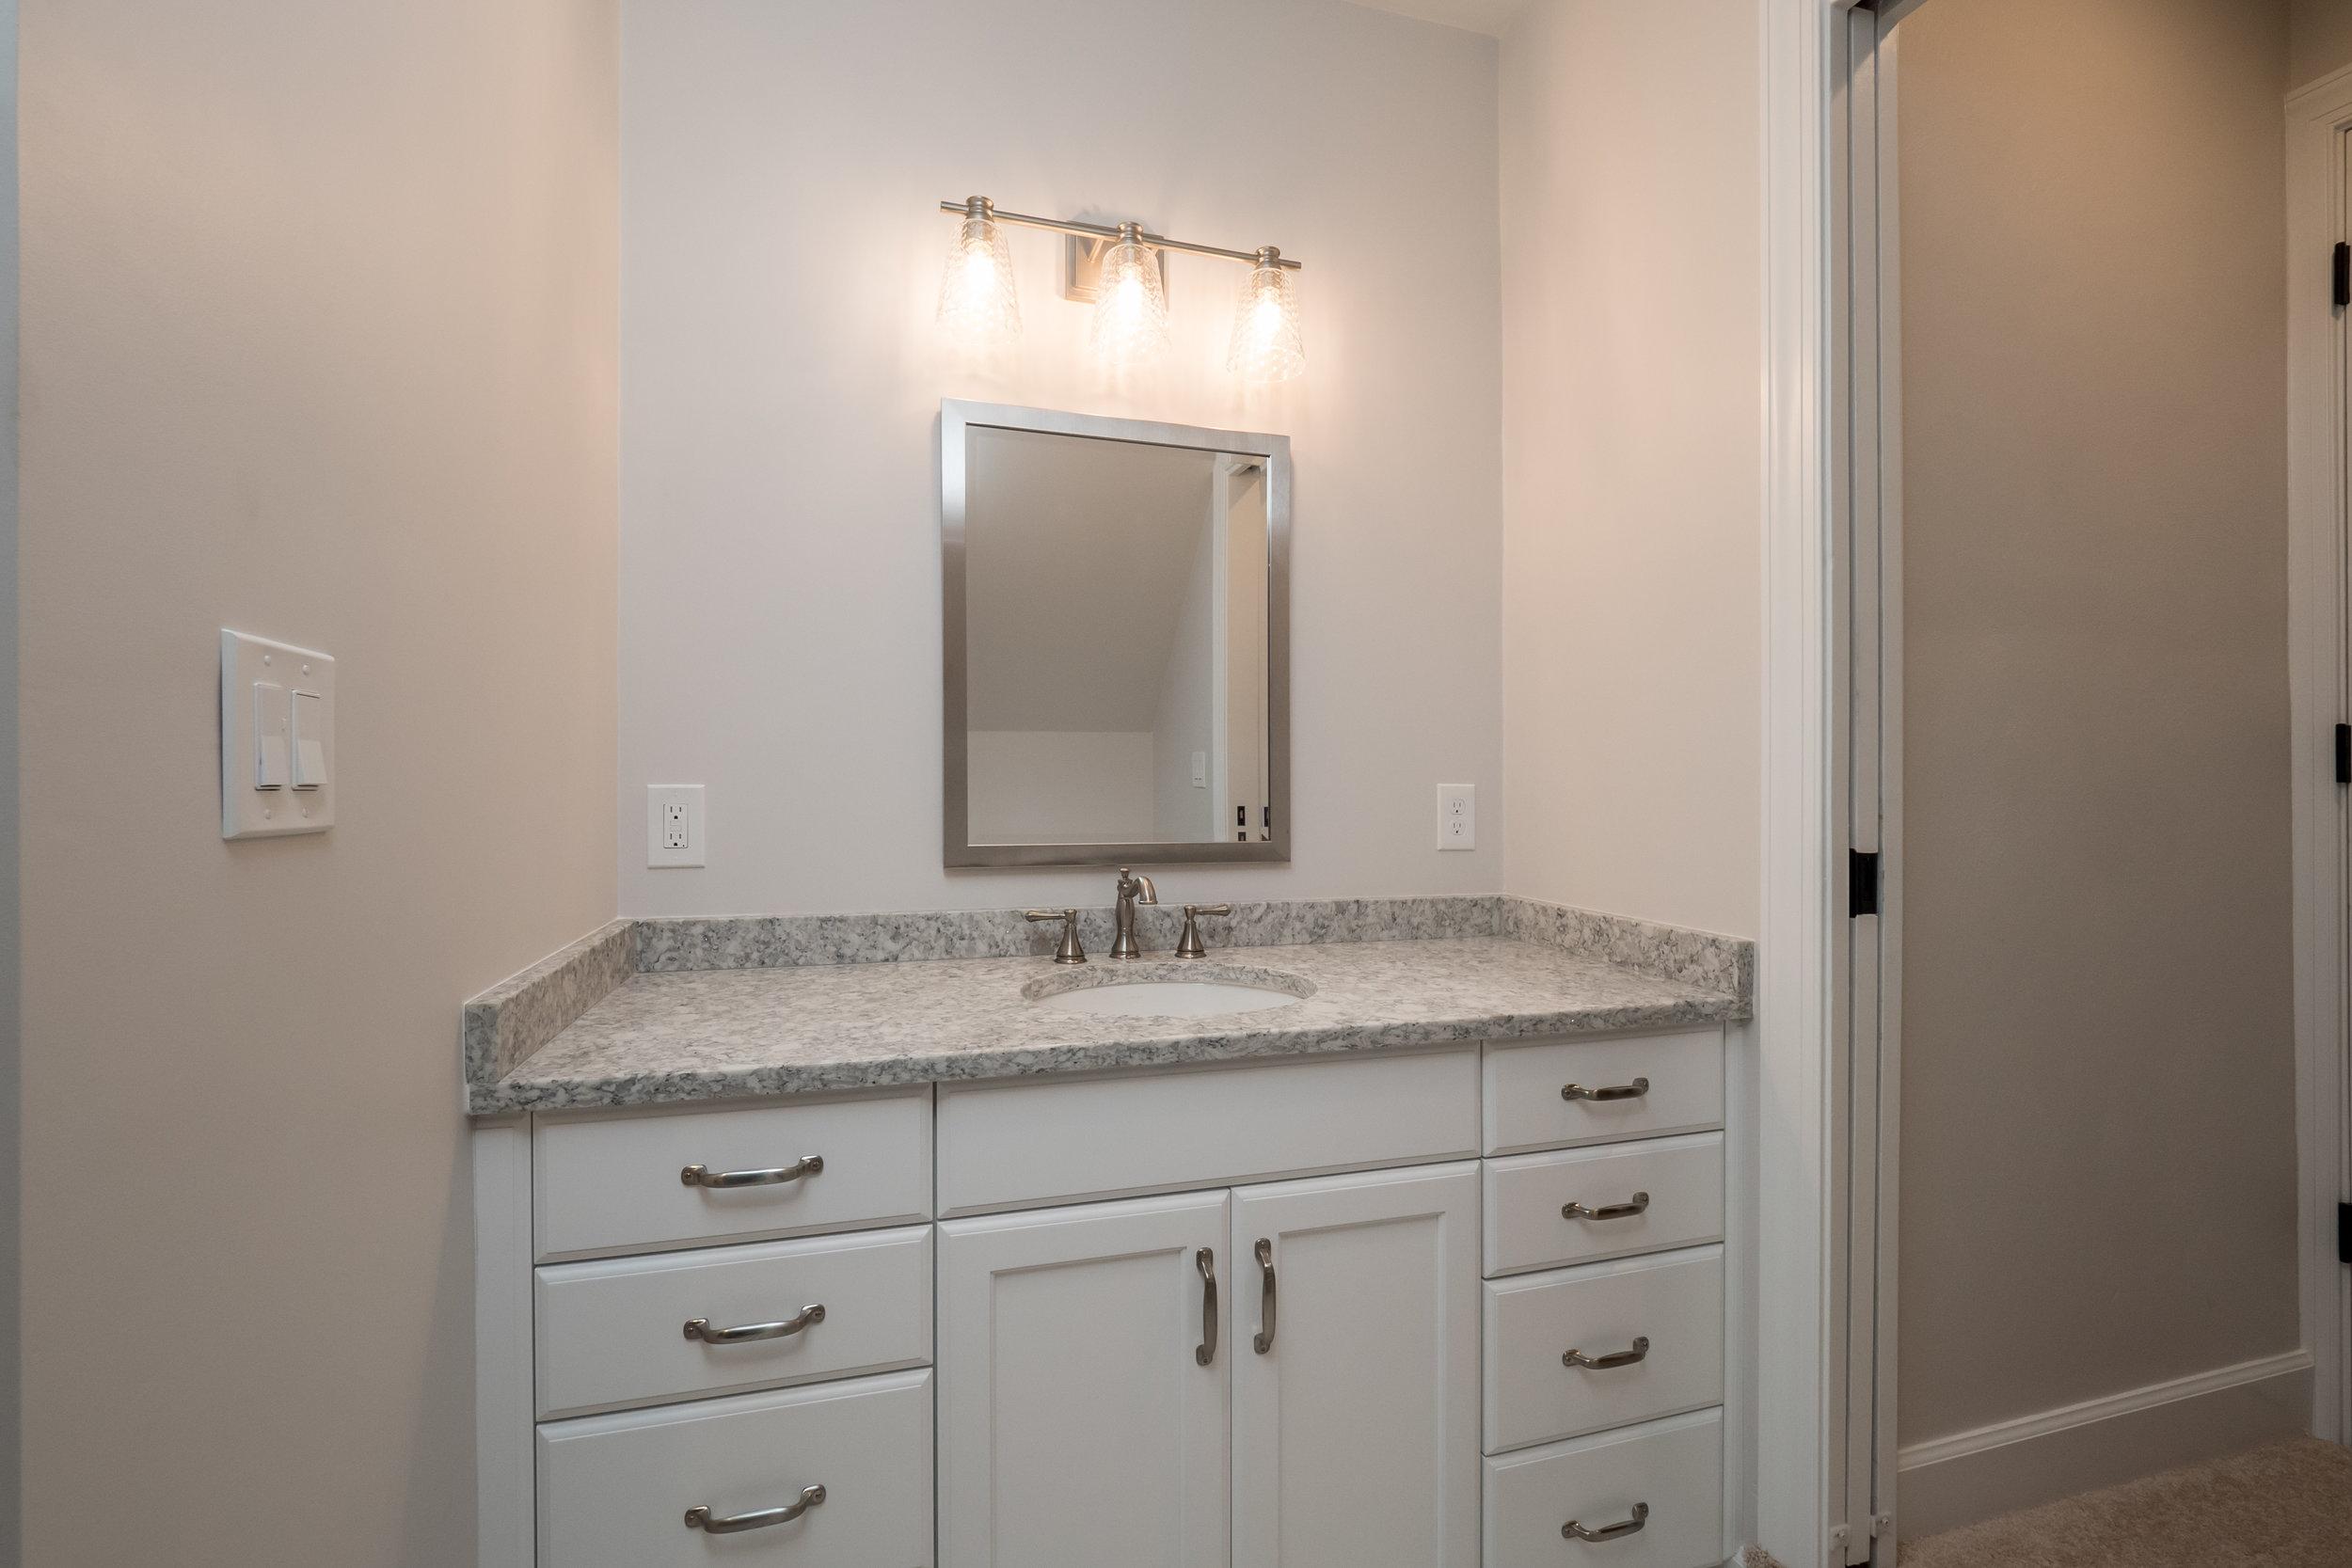 sink and mirror bathroom remodel neutral colors benson homes.jpg